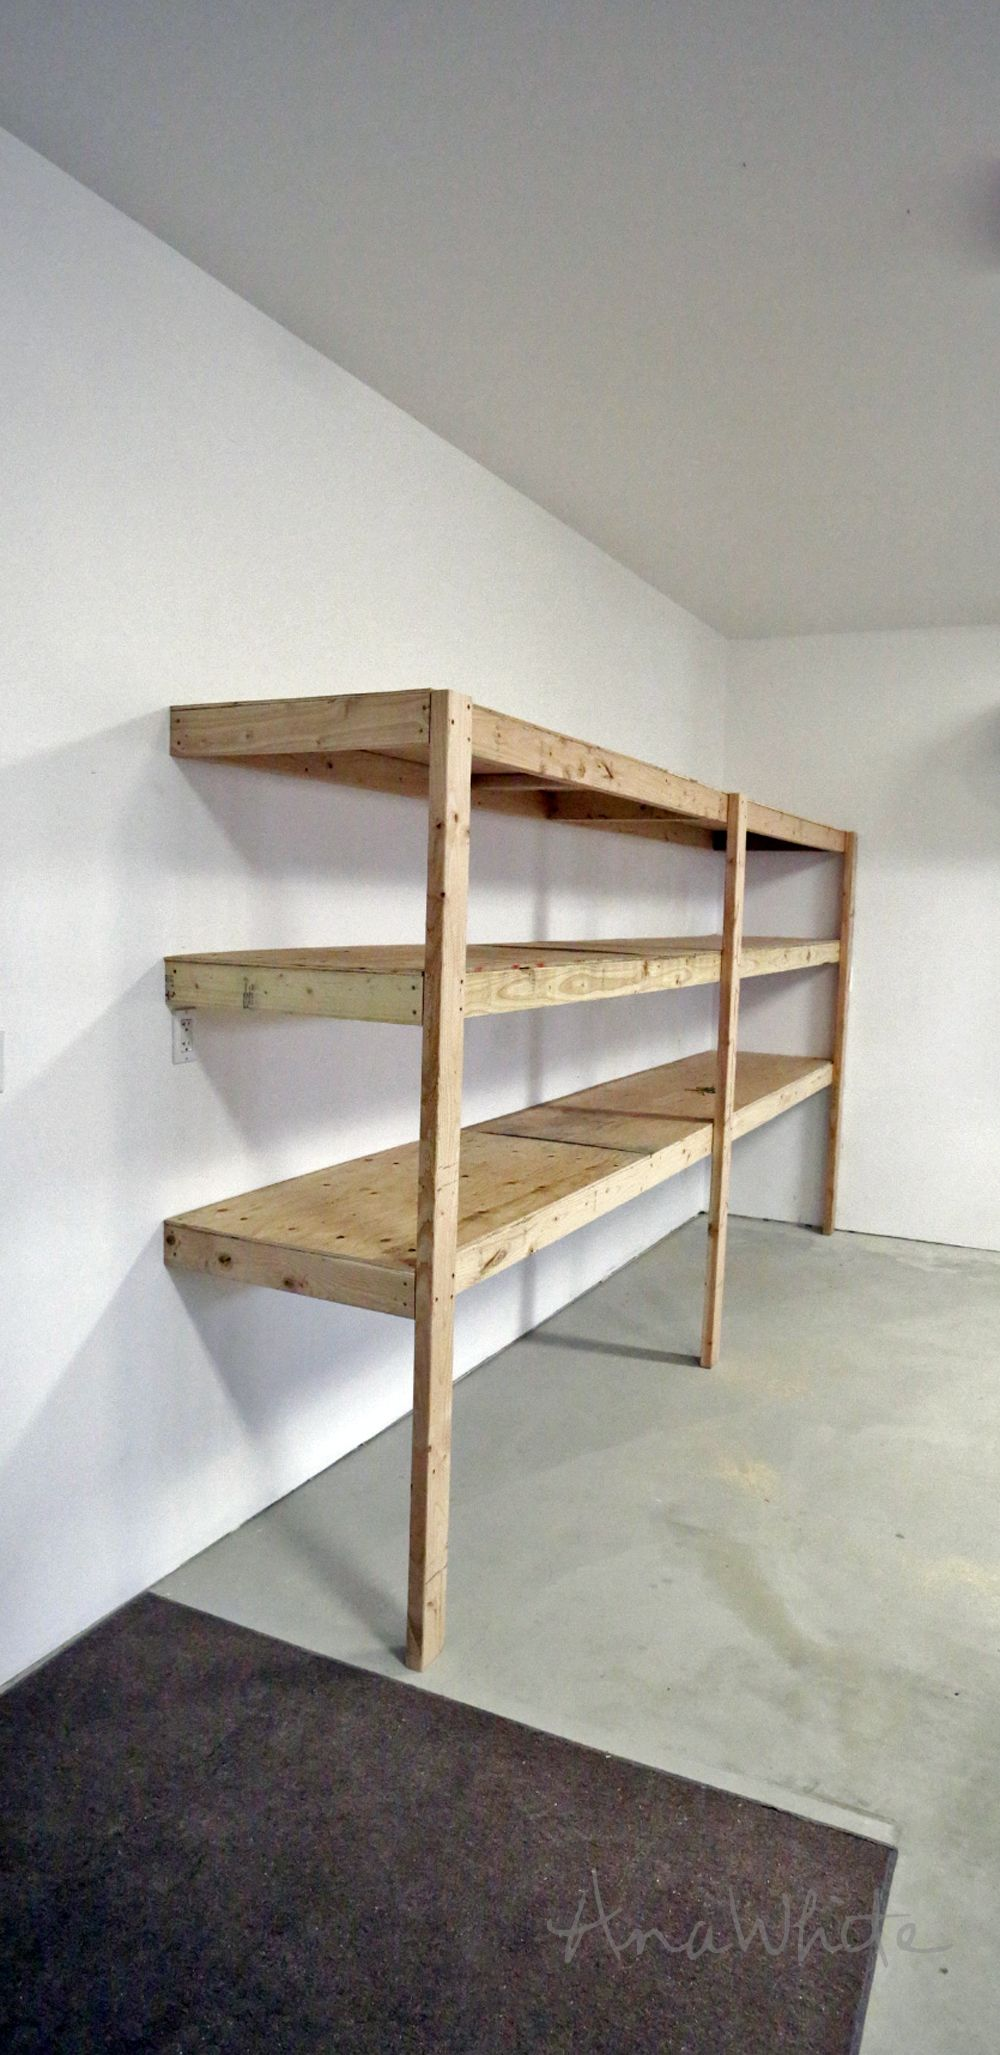 Best Diy Garage Shelves Attached To Walls Plans De Meubles Rangement Maison Organisation De Garage